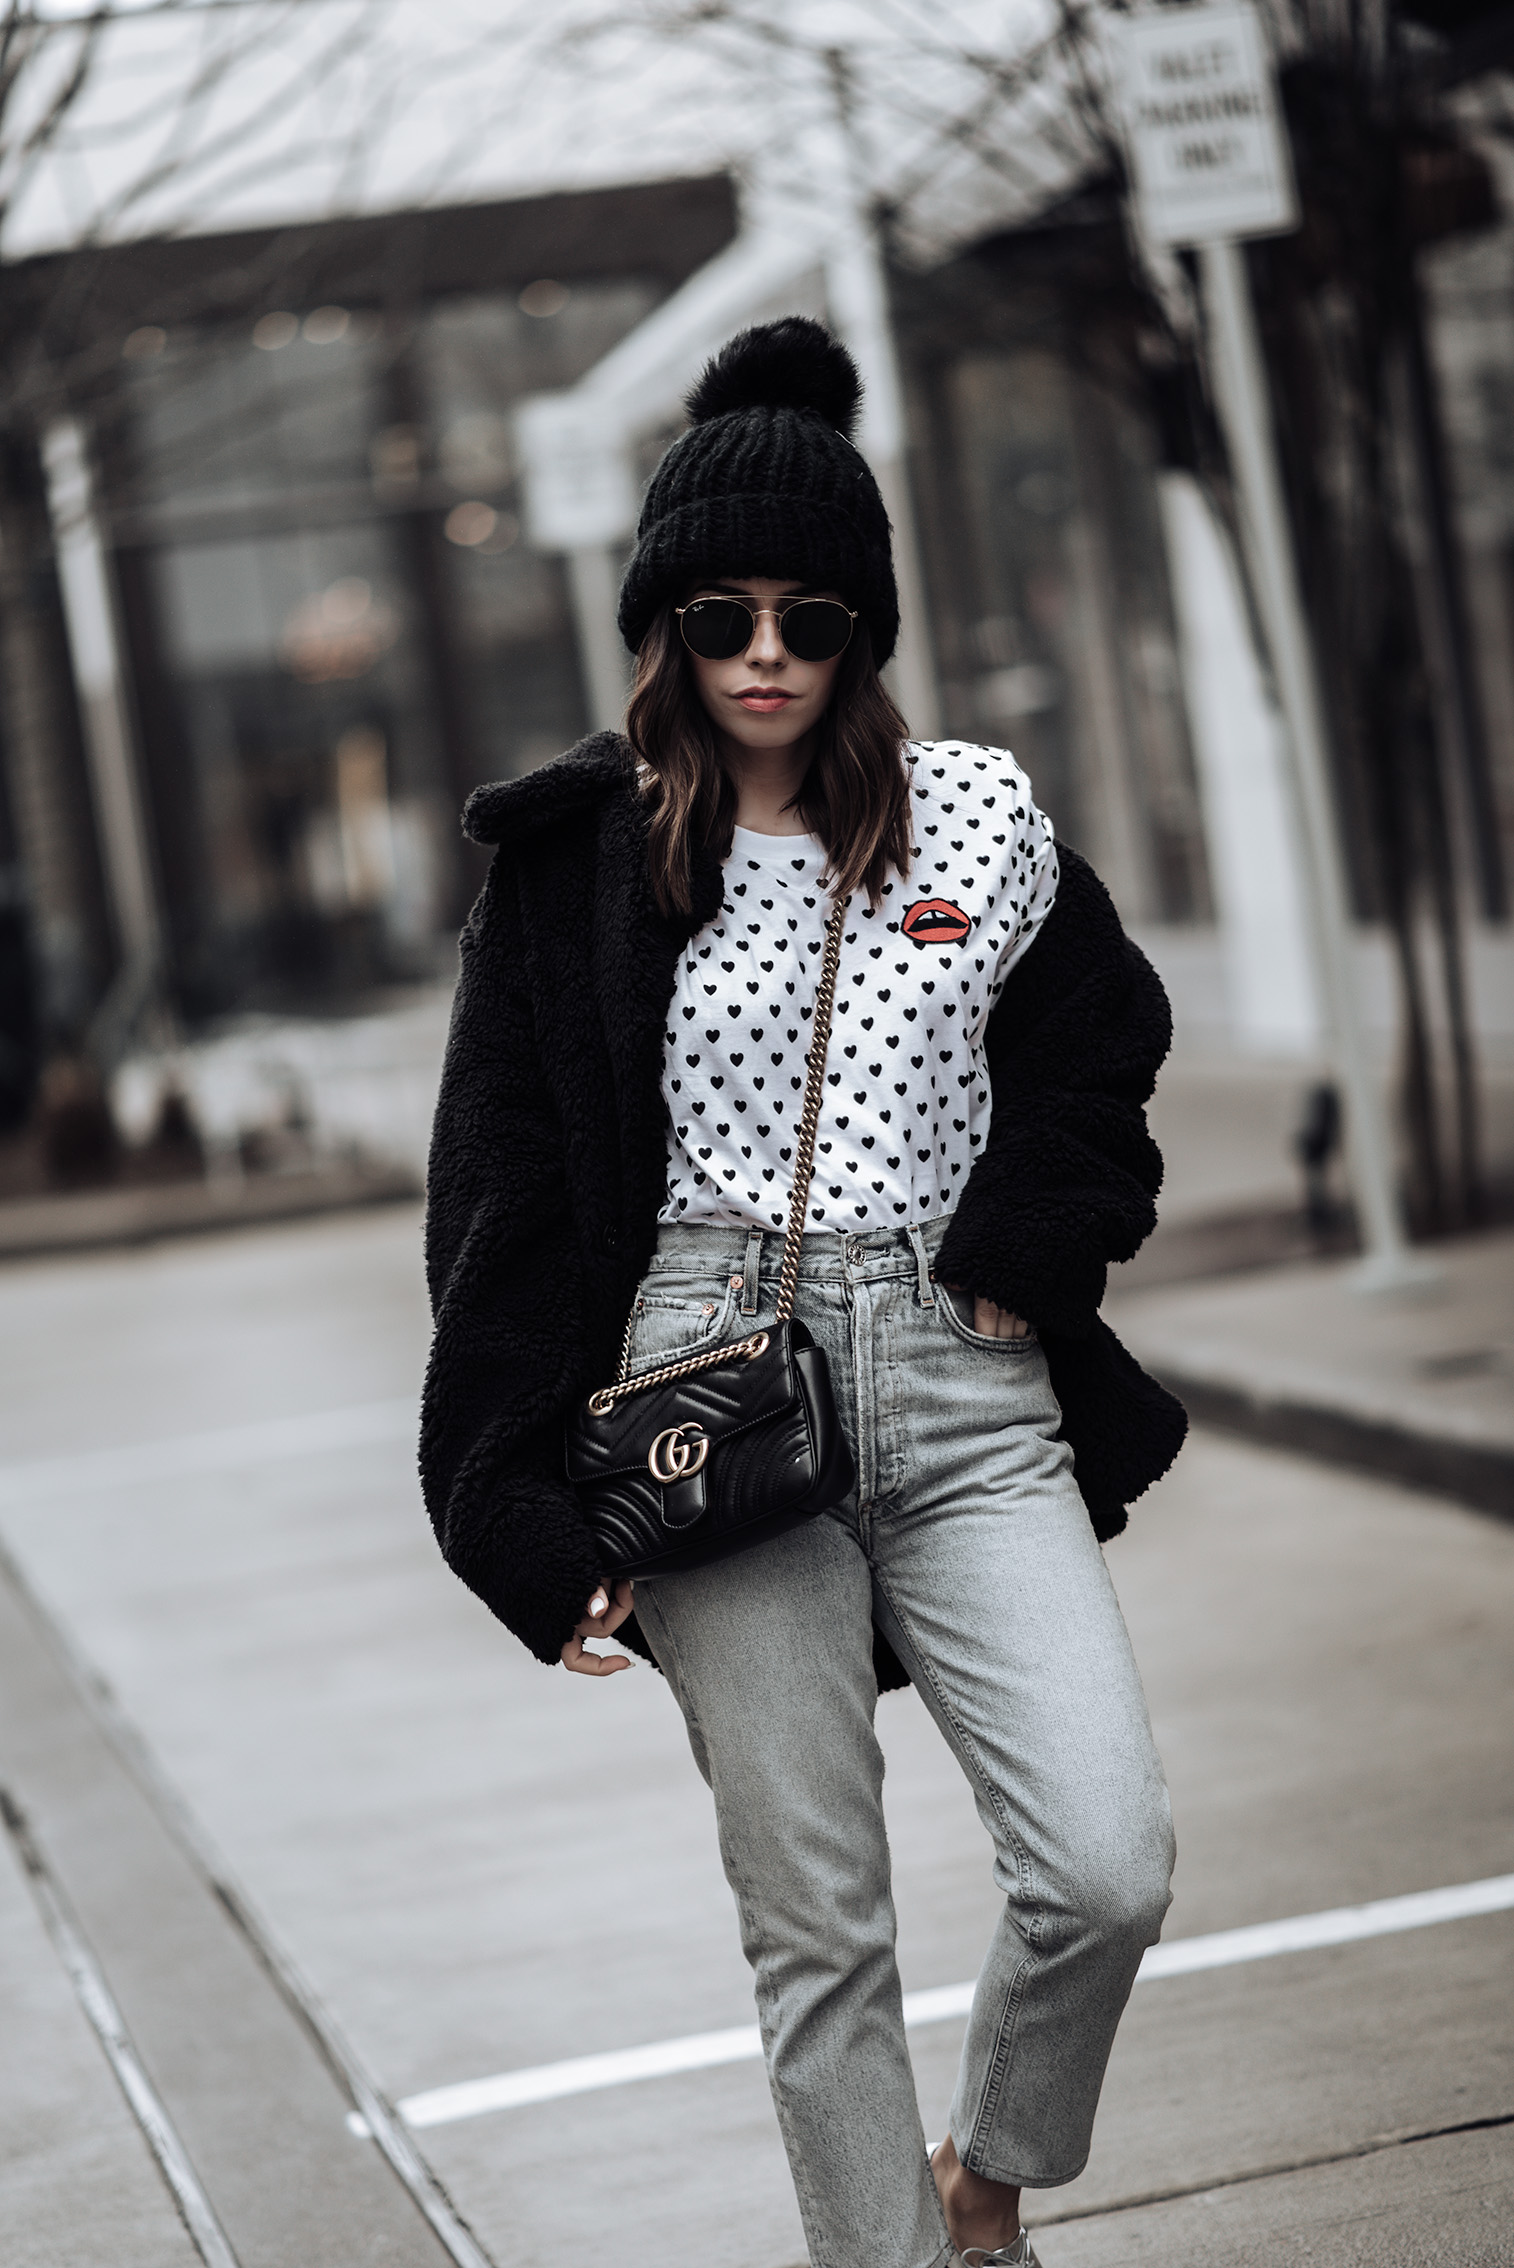 Mini Heart Lara Tee | Agolde Riley High Rise Strait Crop Jean | Stuart Weitzman Oxfords | Beanie | Teddy Pea Coat #shopbop #liketkit #streetstyle